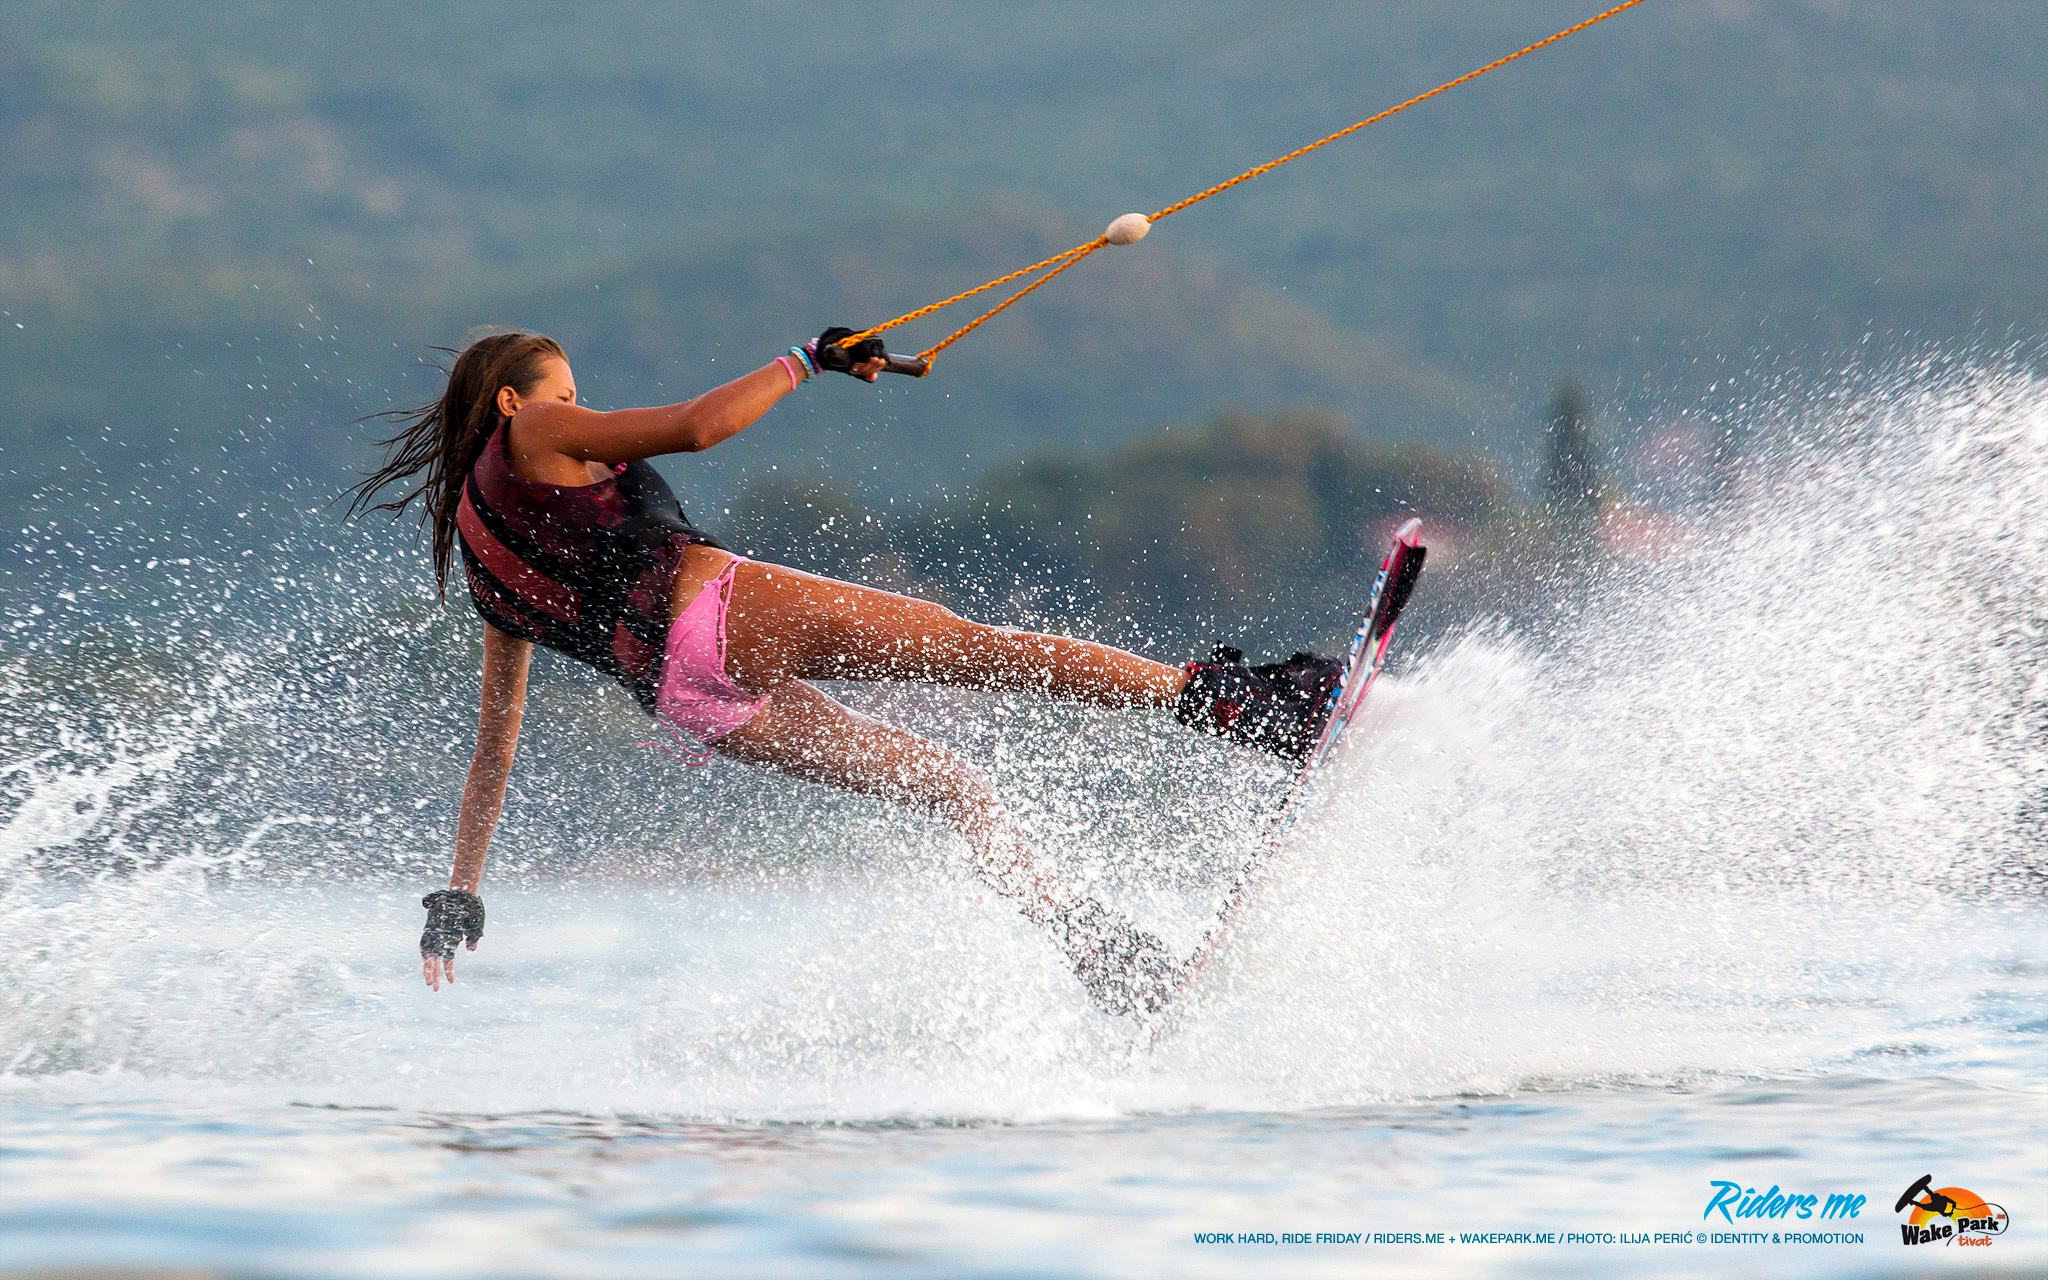 Lana Roganović - work hard, ride friday - wakepark.me © riders.me